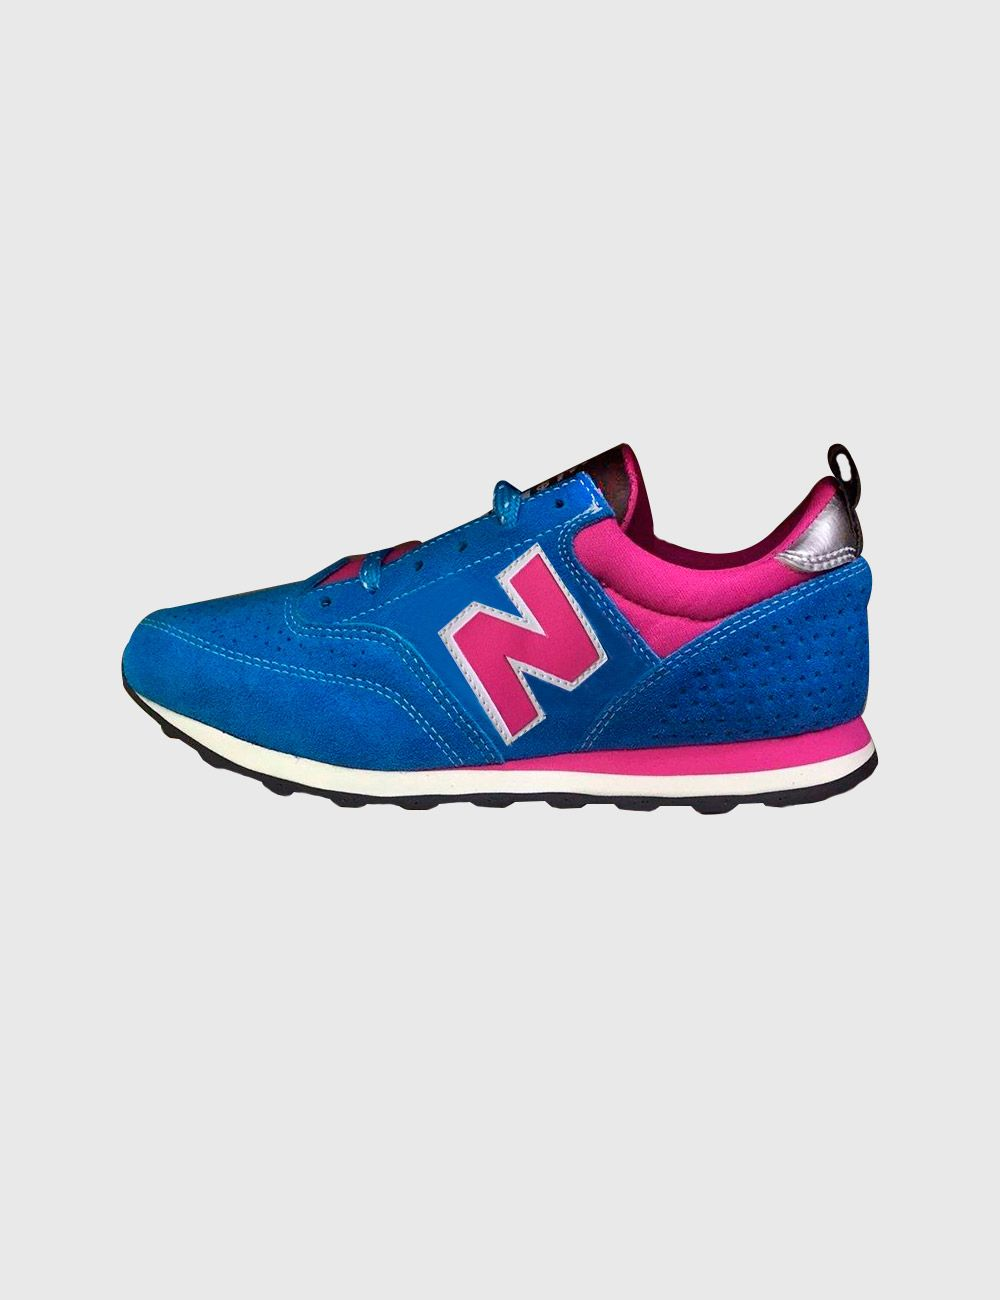 new balance 373 azul marinho e rosa